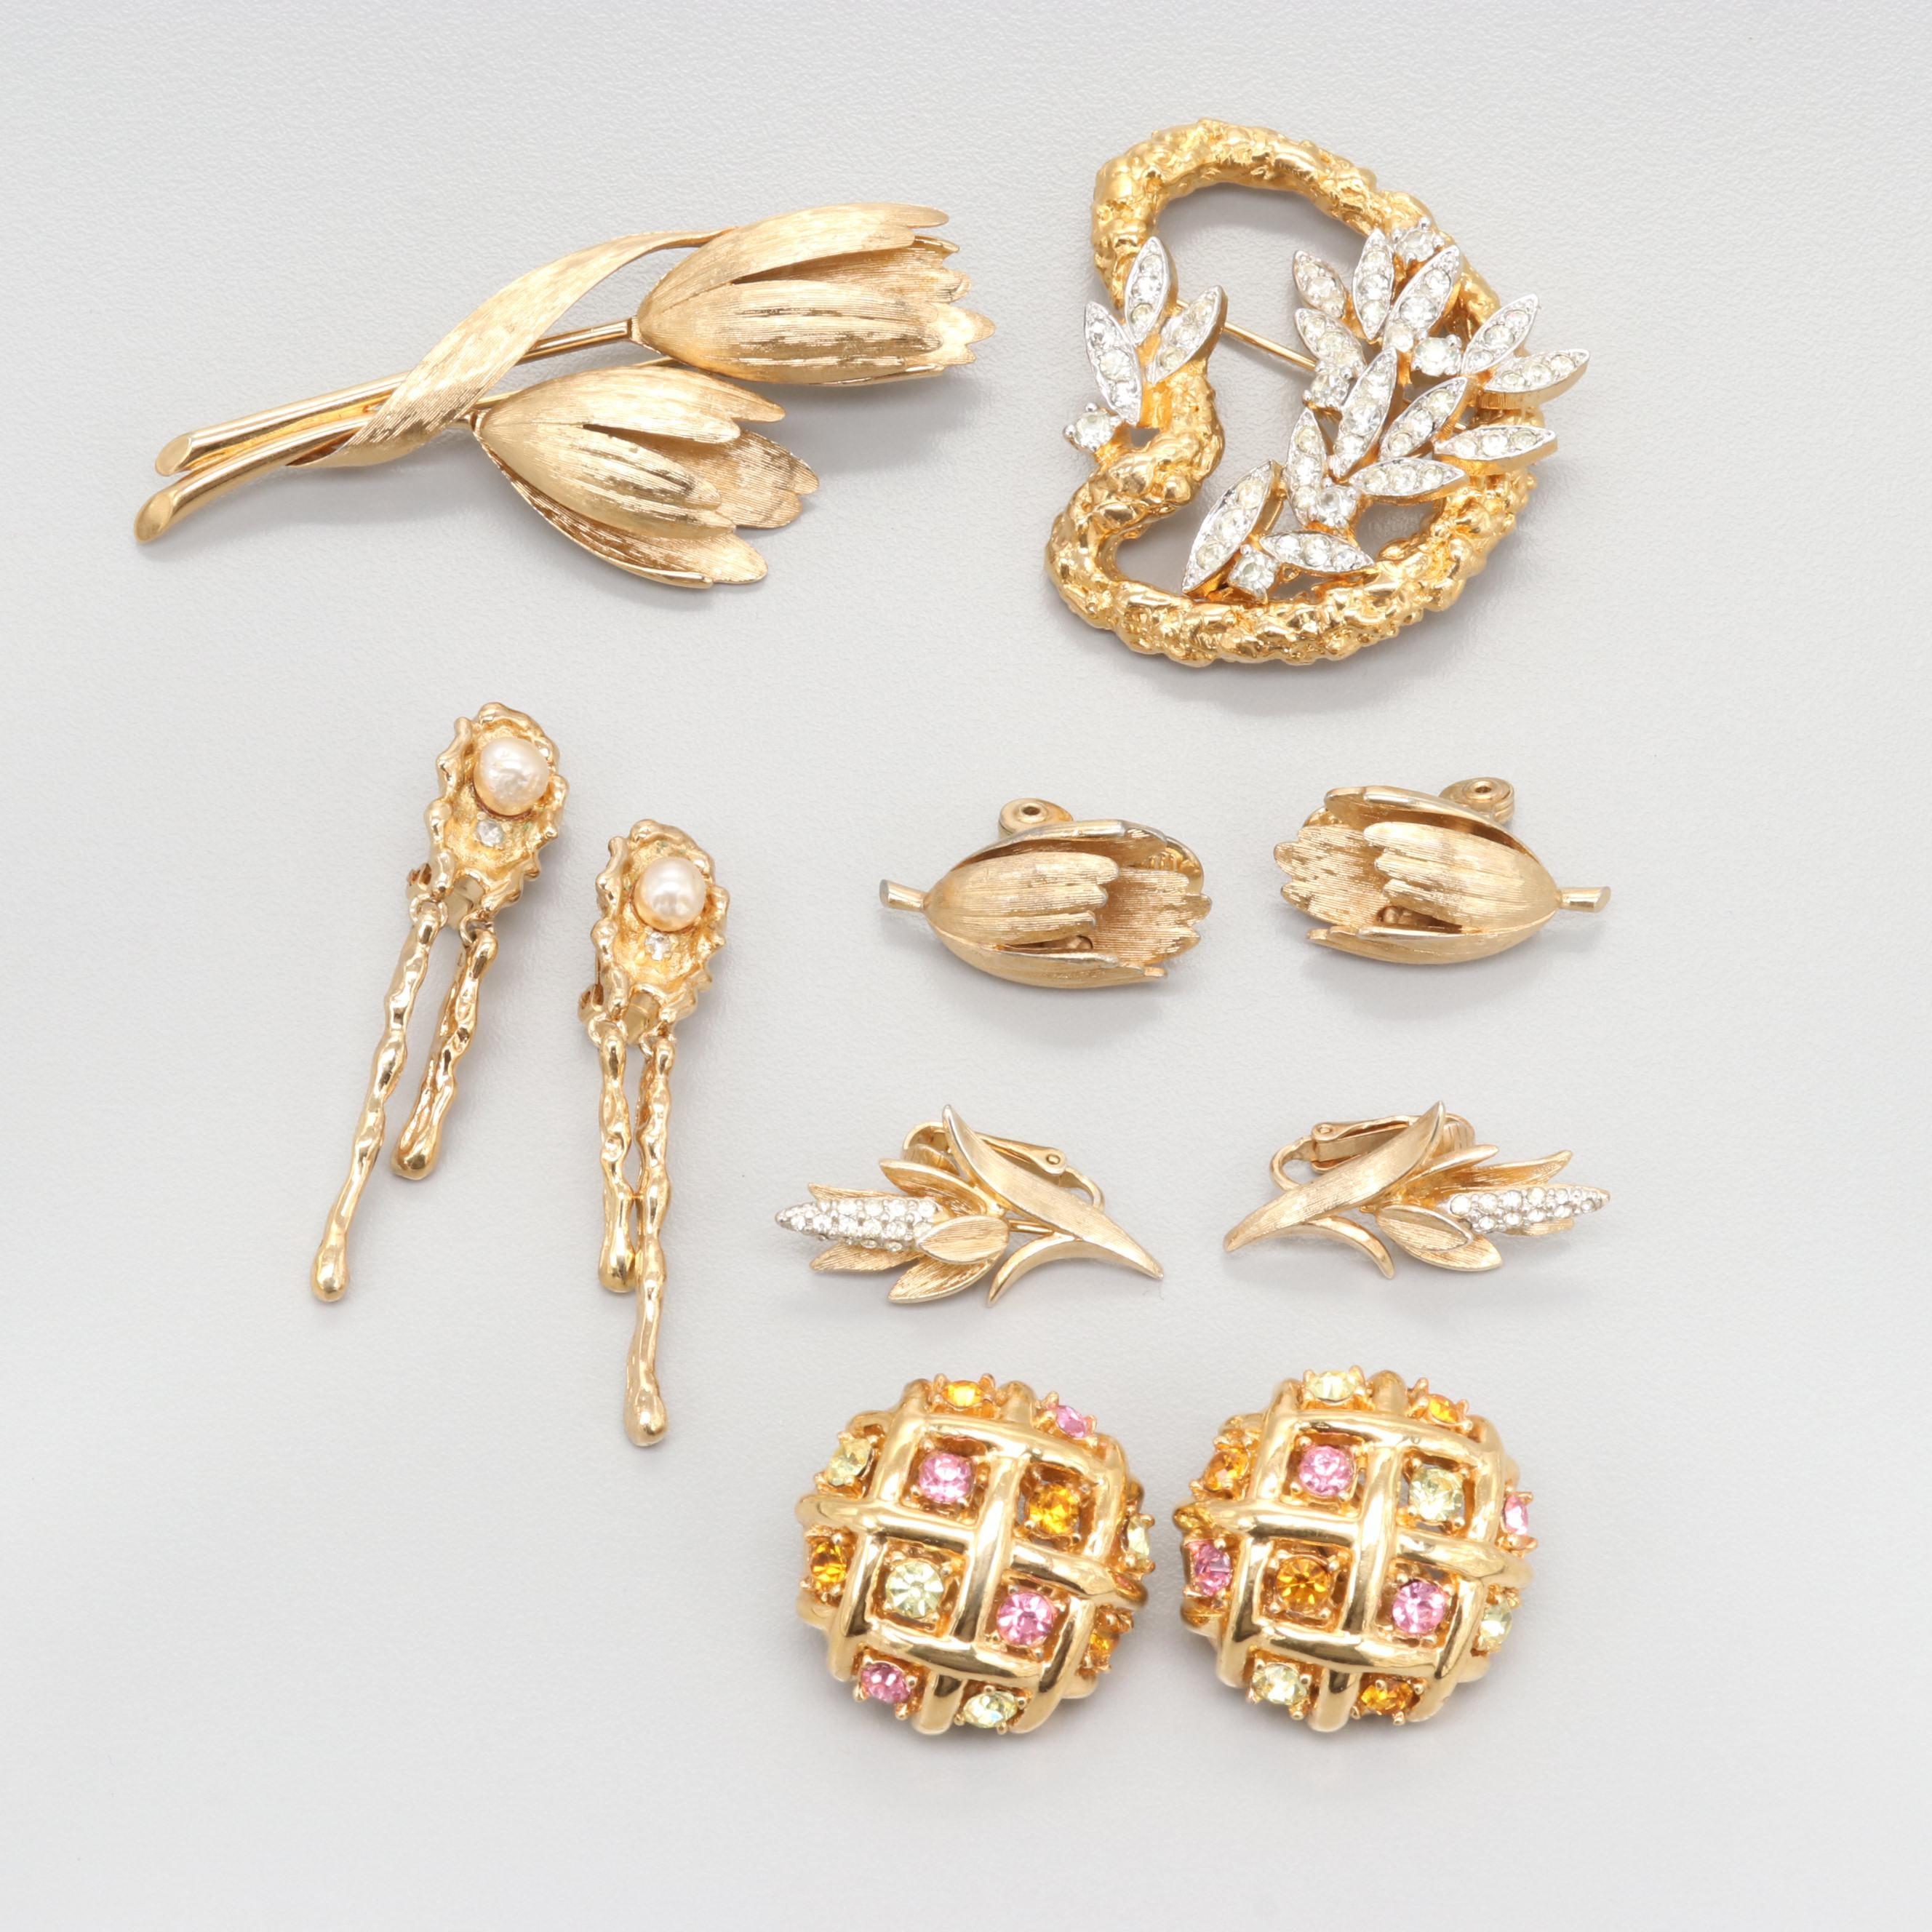 1980s Gold Tone Rhinestone Jewelry Including Ciner, Jomaz, Boucher, Panetta